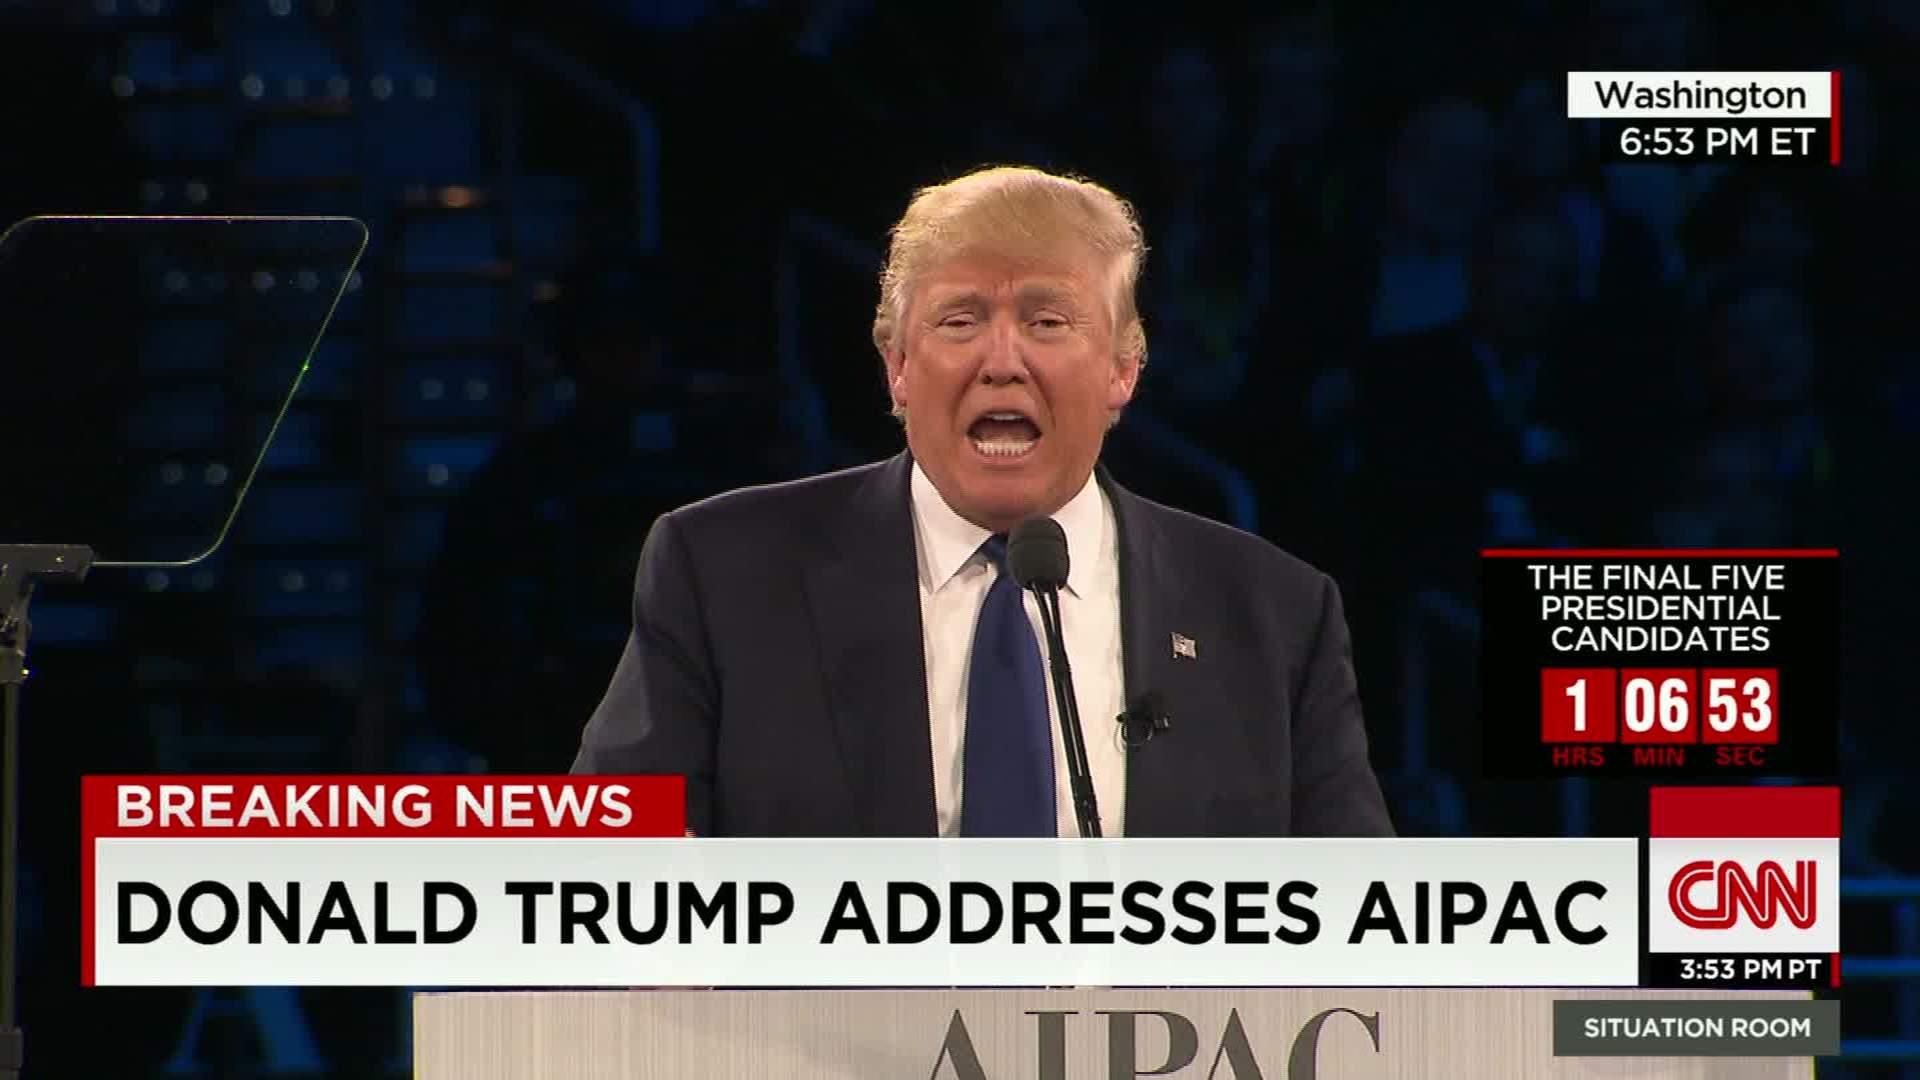 Donald Trump Exposed AIPAC